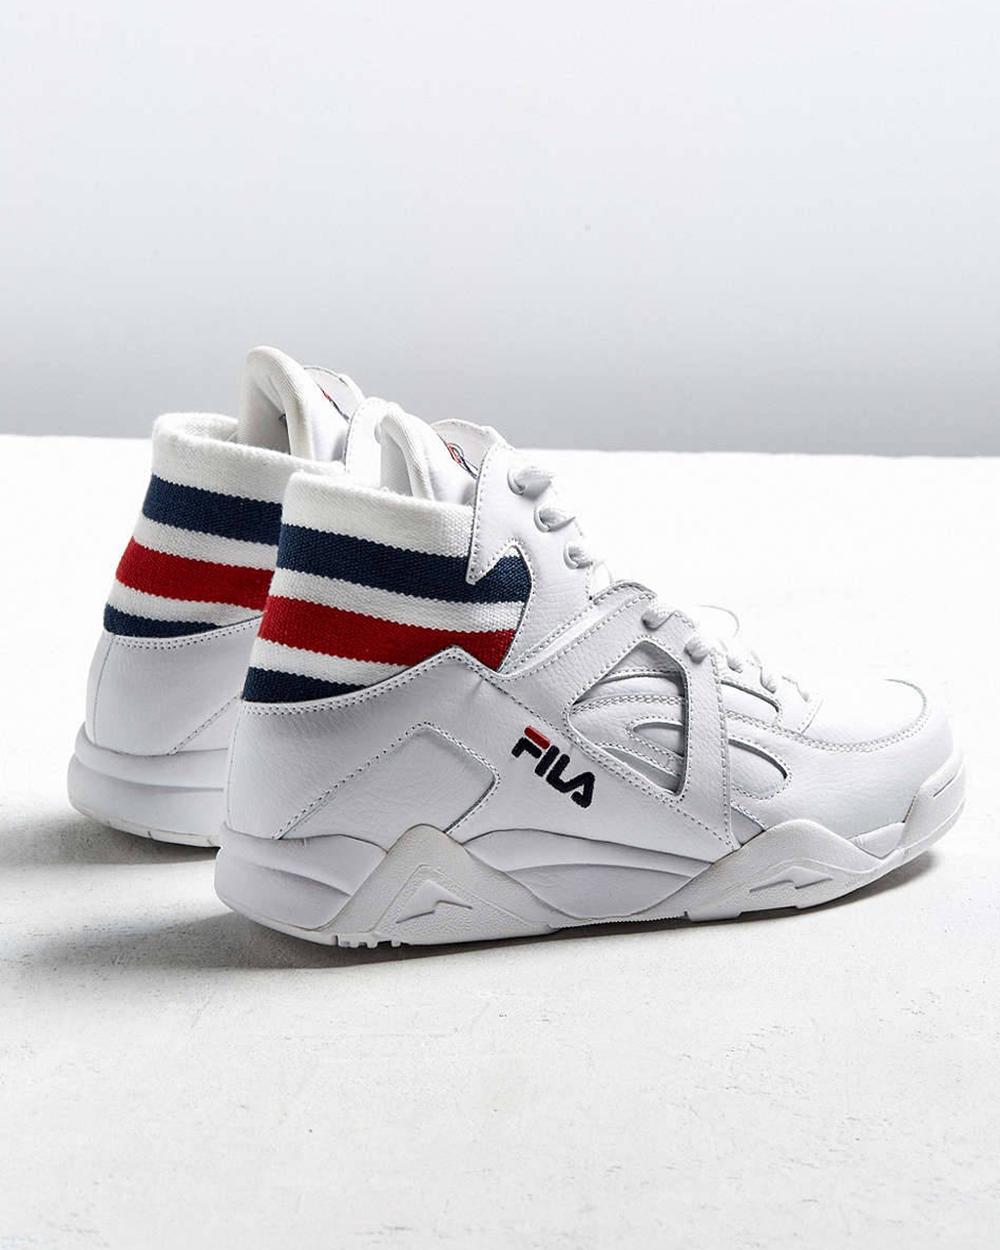 fashion, Sneakers, Sneakers fashion